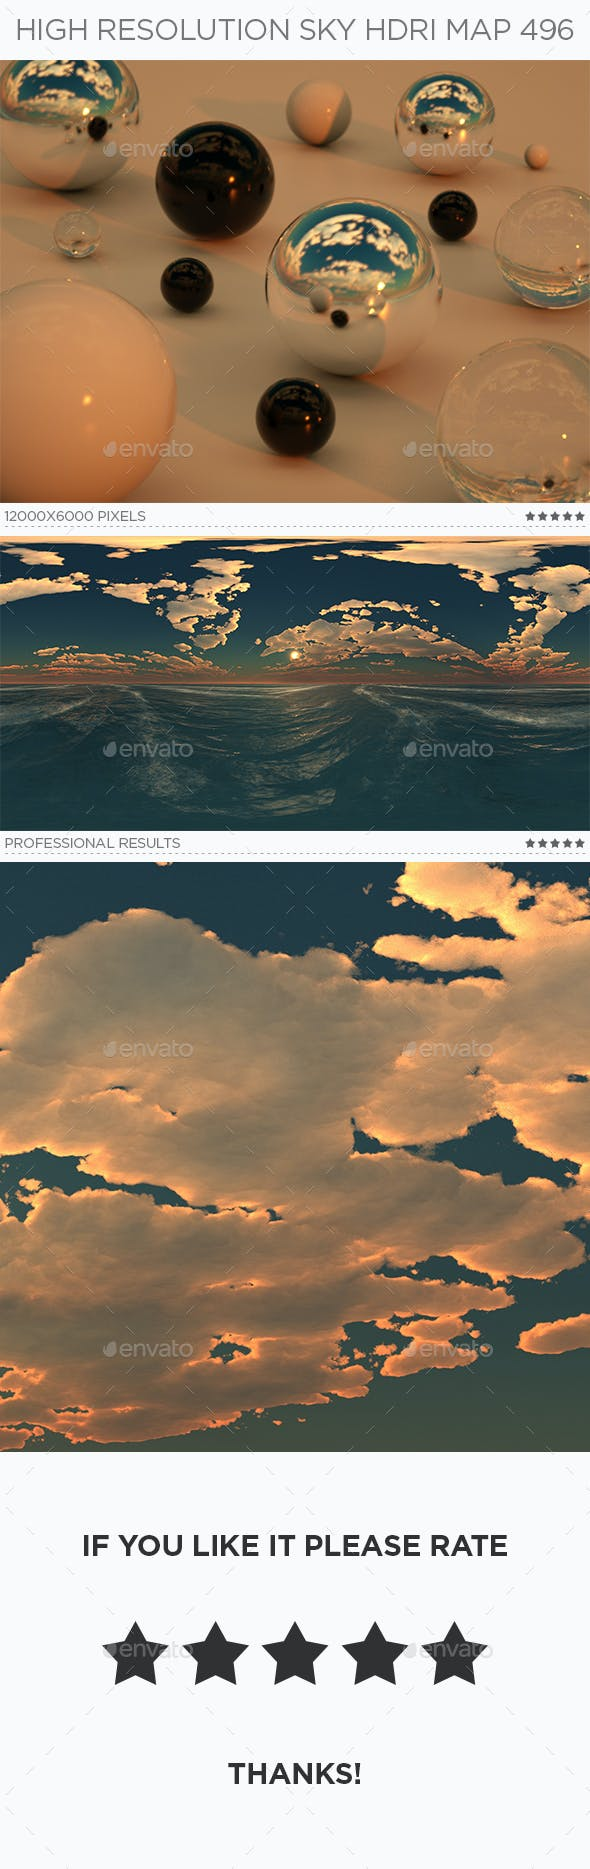 High Resolution Sky HDRi Map 496 - 3DOcean Item for Sale